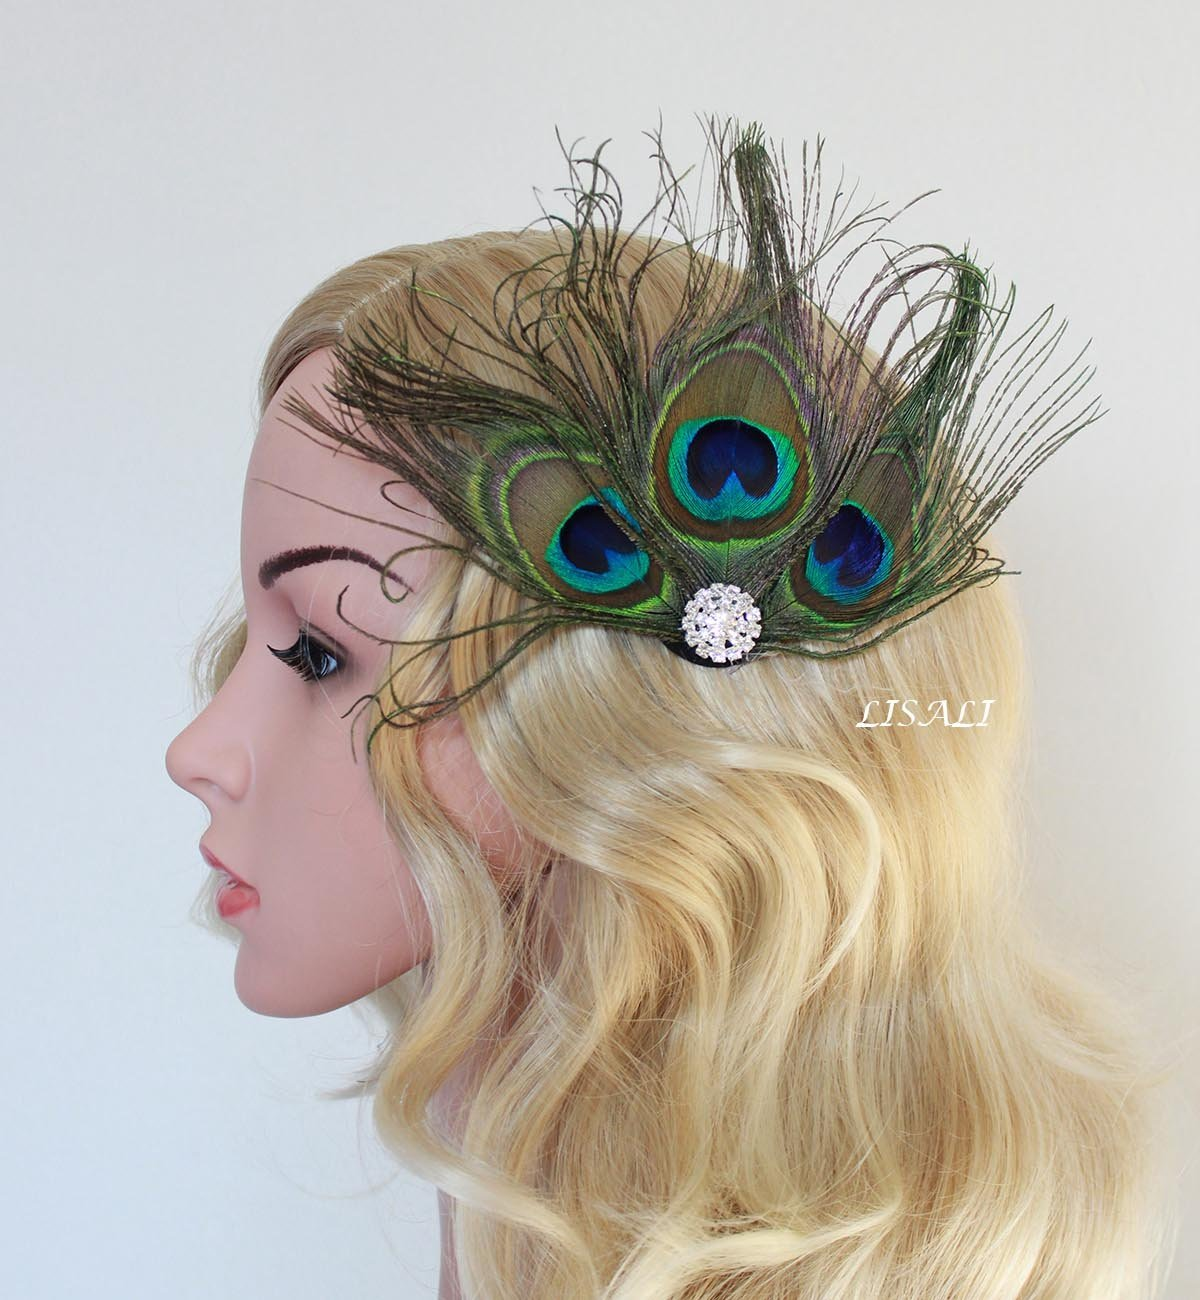 b1d47f6cae227 Get Quotations · LISALI Great Gatsby Headpiece Bridal Feather Headpiece